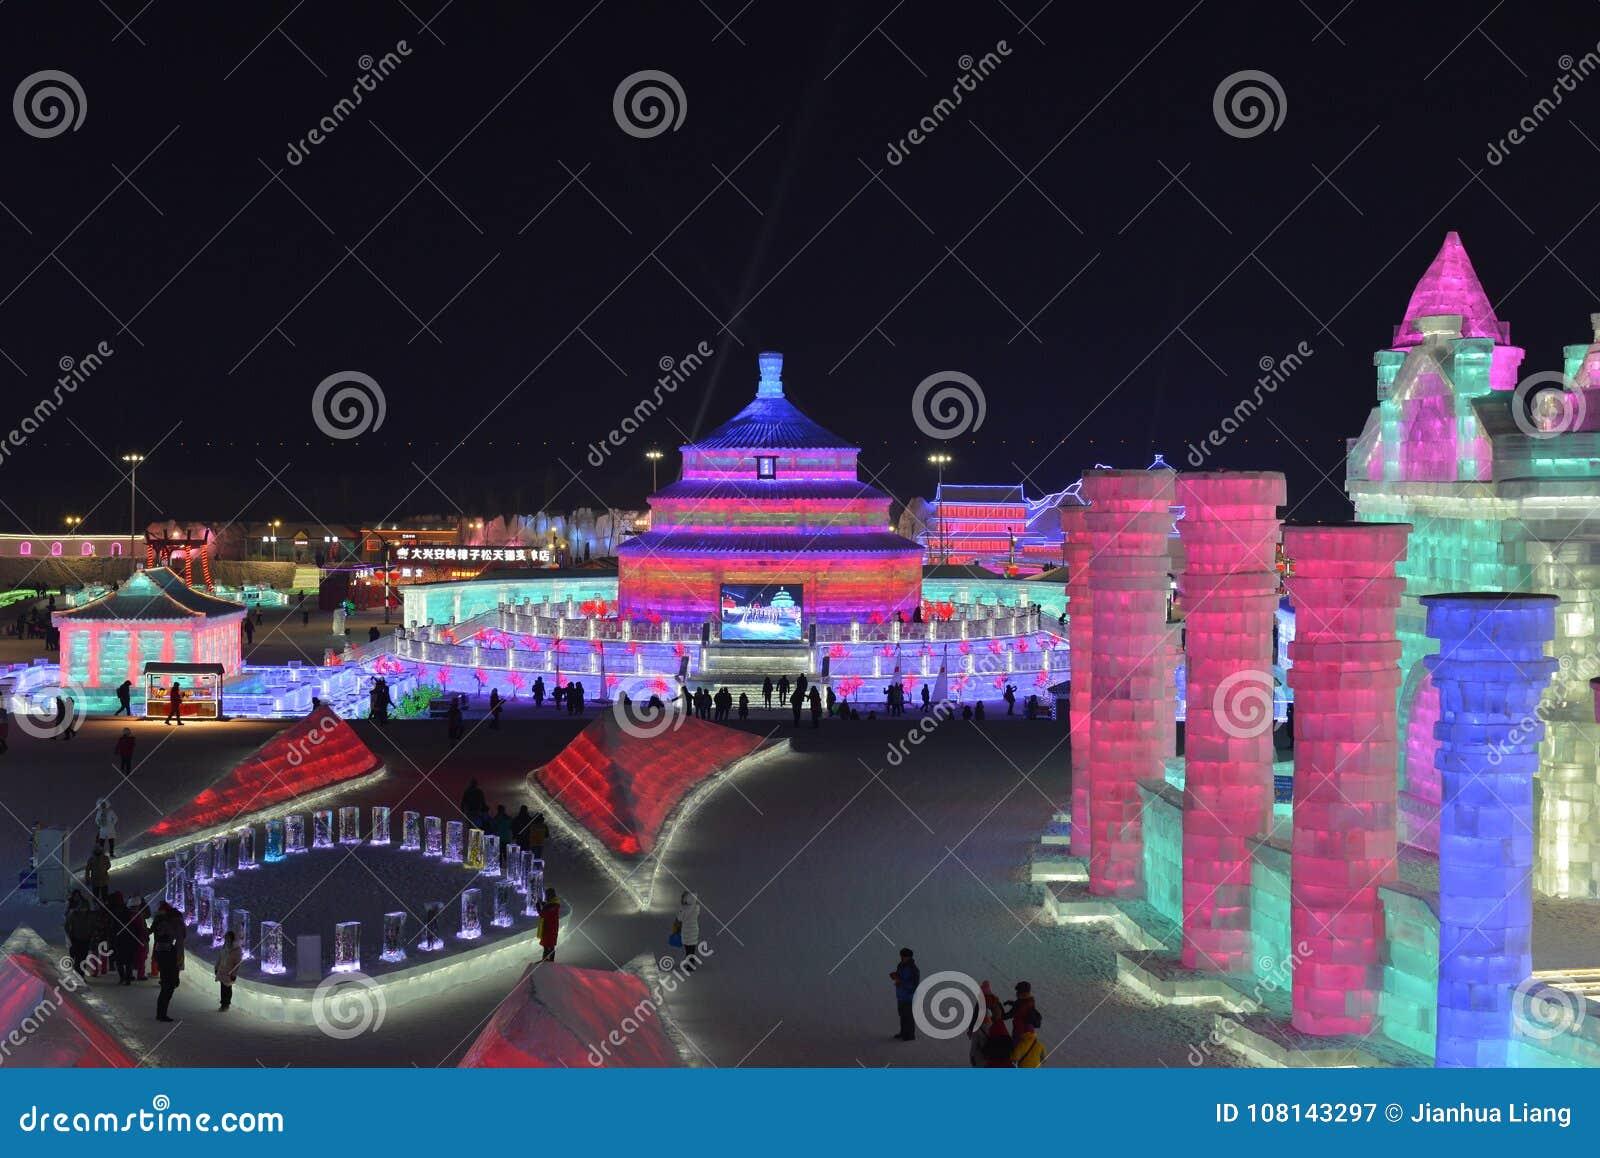 Harbin International Ice and Snow Sculpture Festival 2018